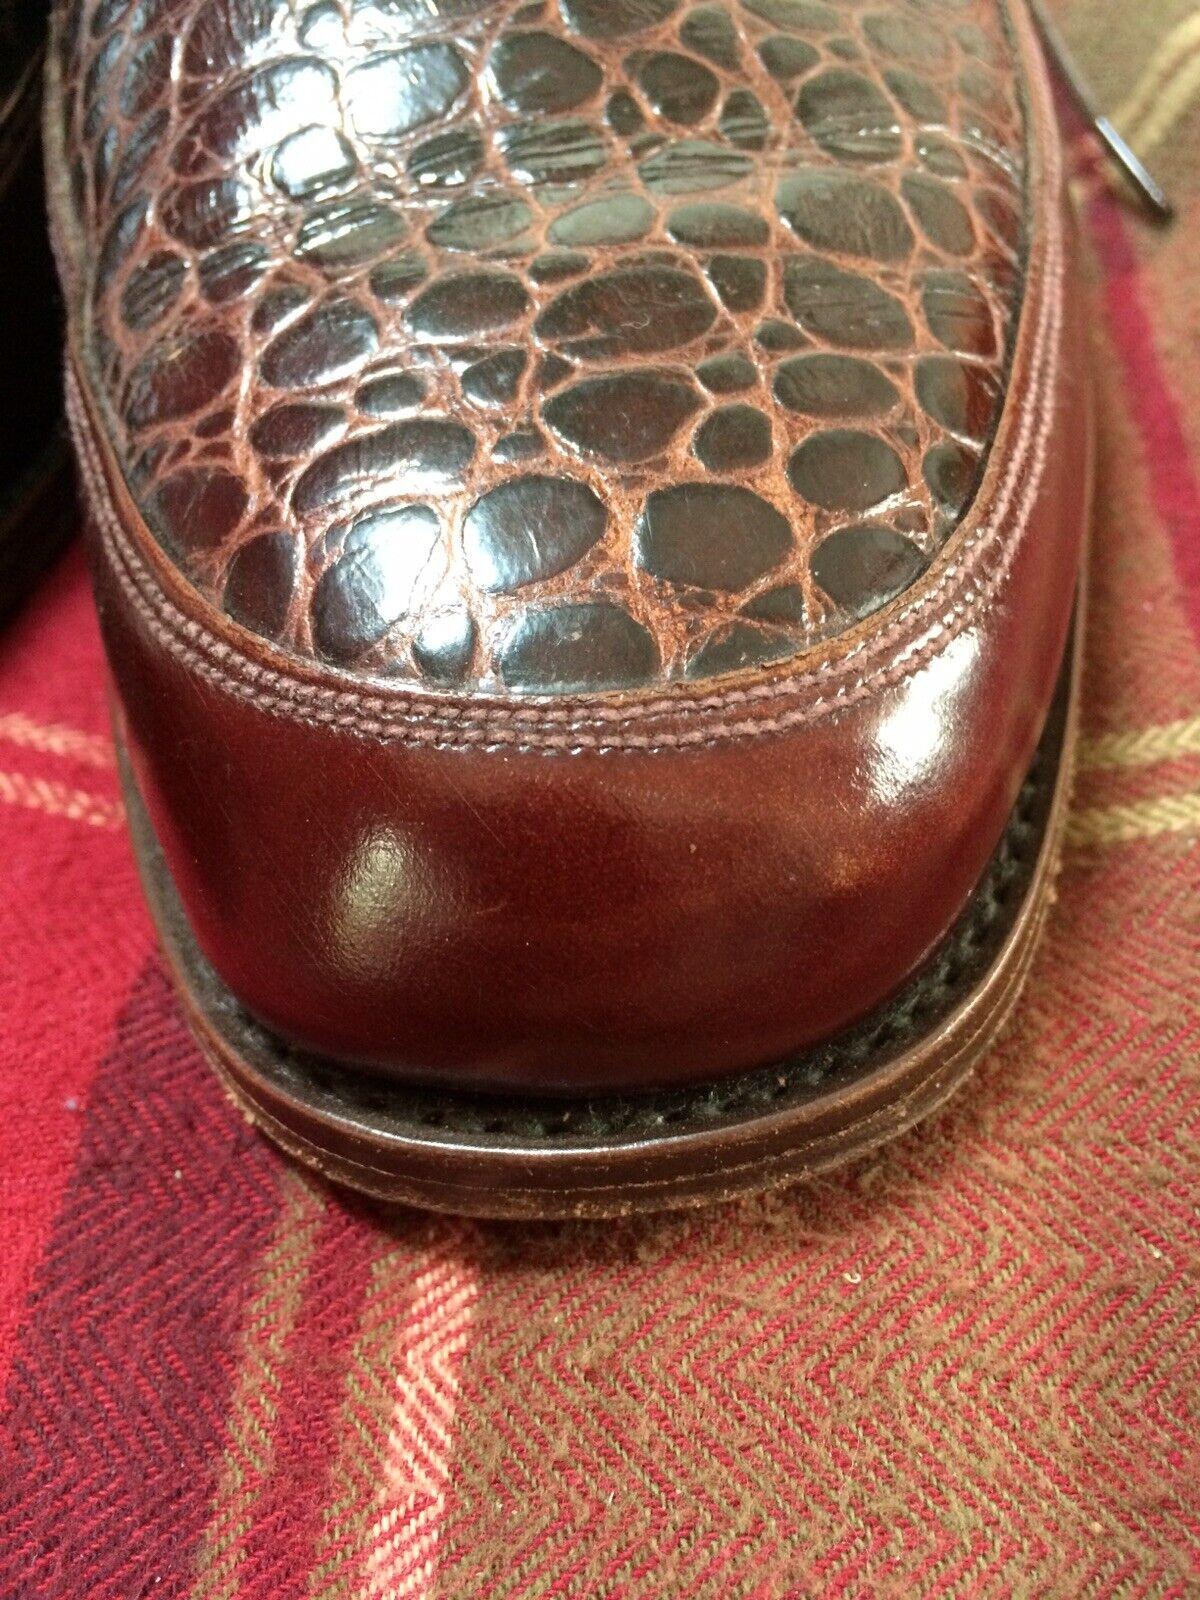 Zapatos masculinos hechos a mano, marrón, Inglaterra 7